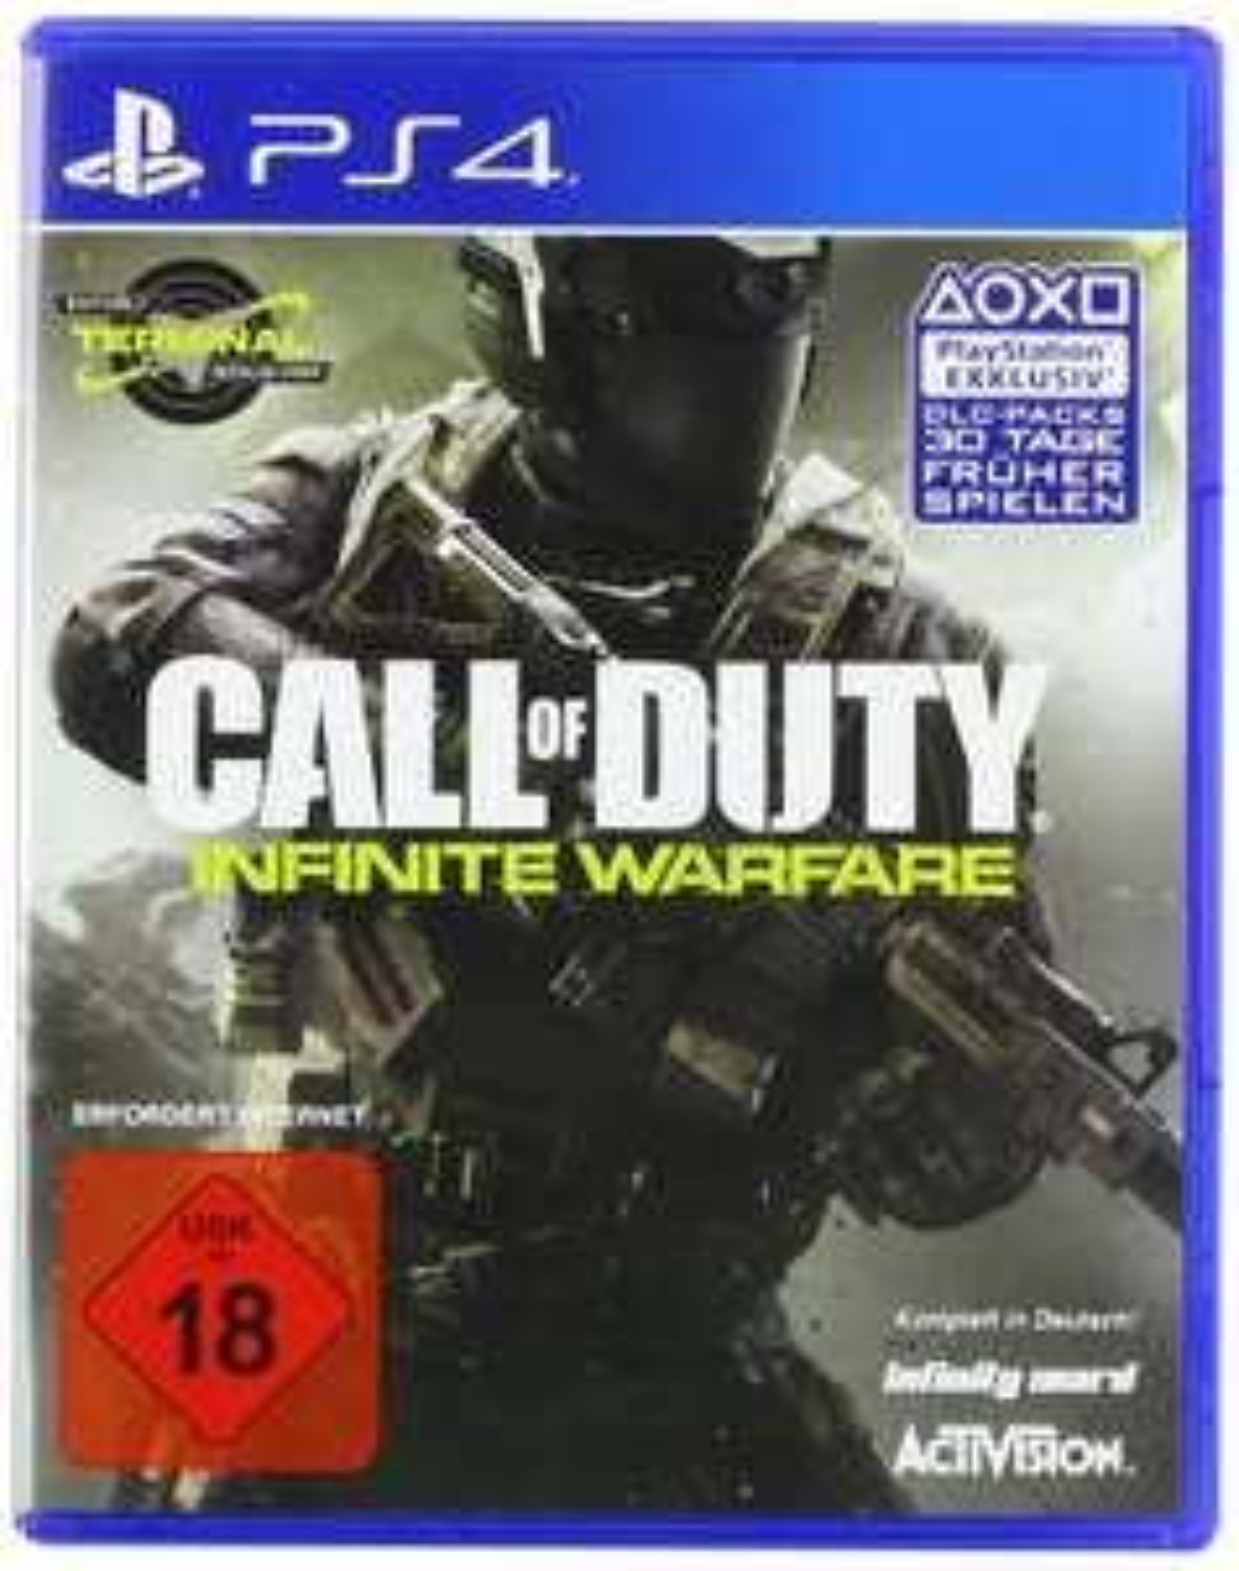 [Lokal Reichenbach] Expert Sammeldeal - PS4 Games [Call of Duty Infinite Warfare 1,99€ | Star Wars - Jedi Fallen Order 5€ |